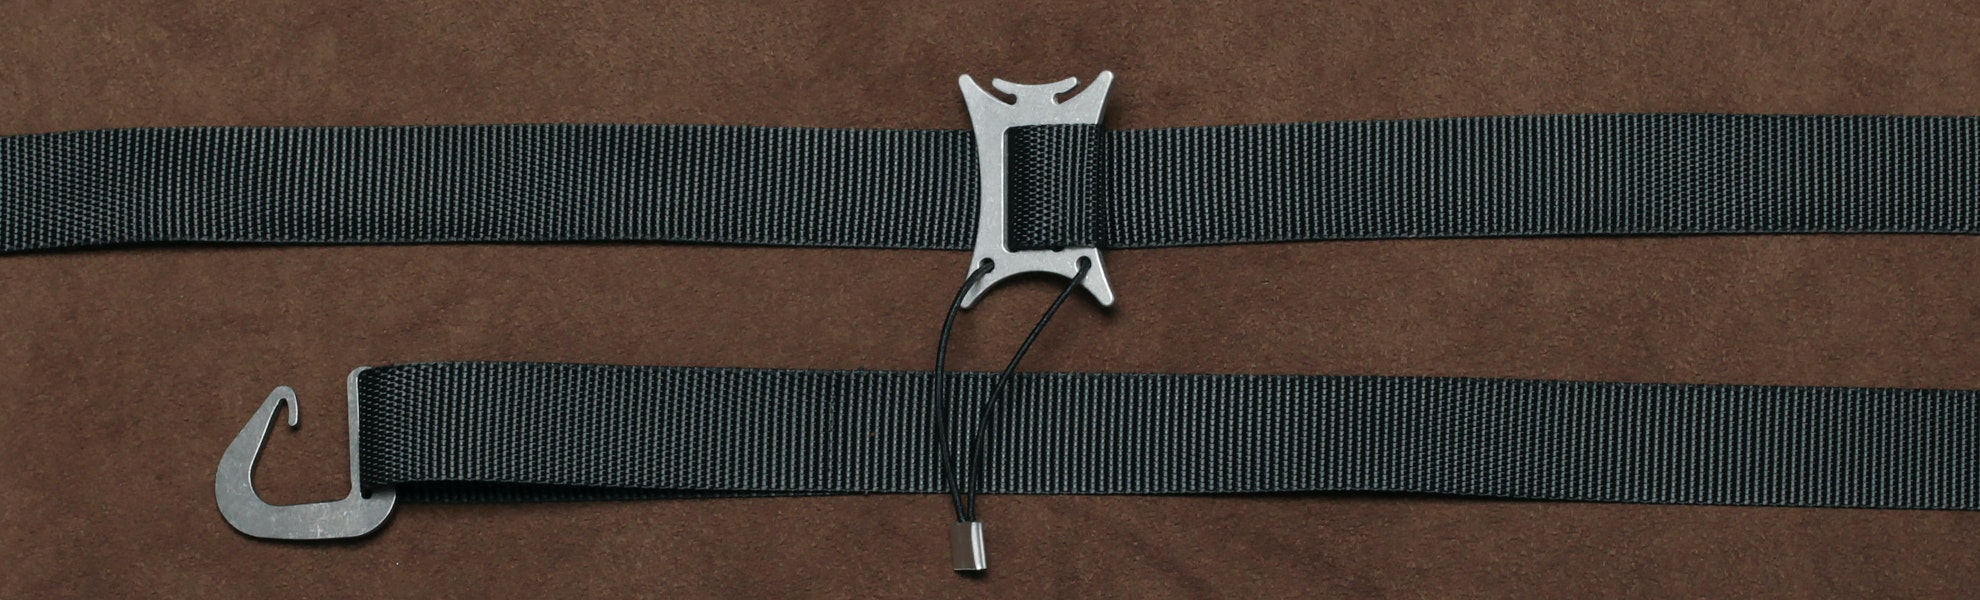 DutchWare Buckle Suspension Kit